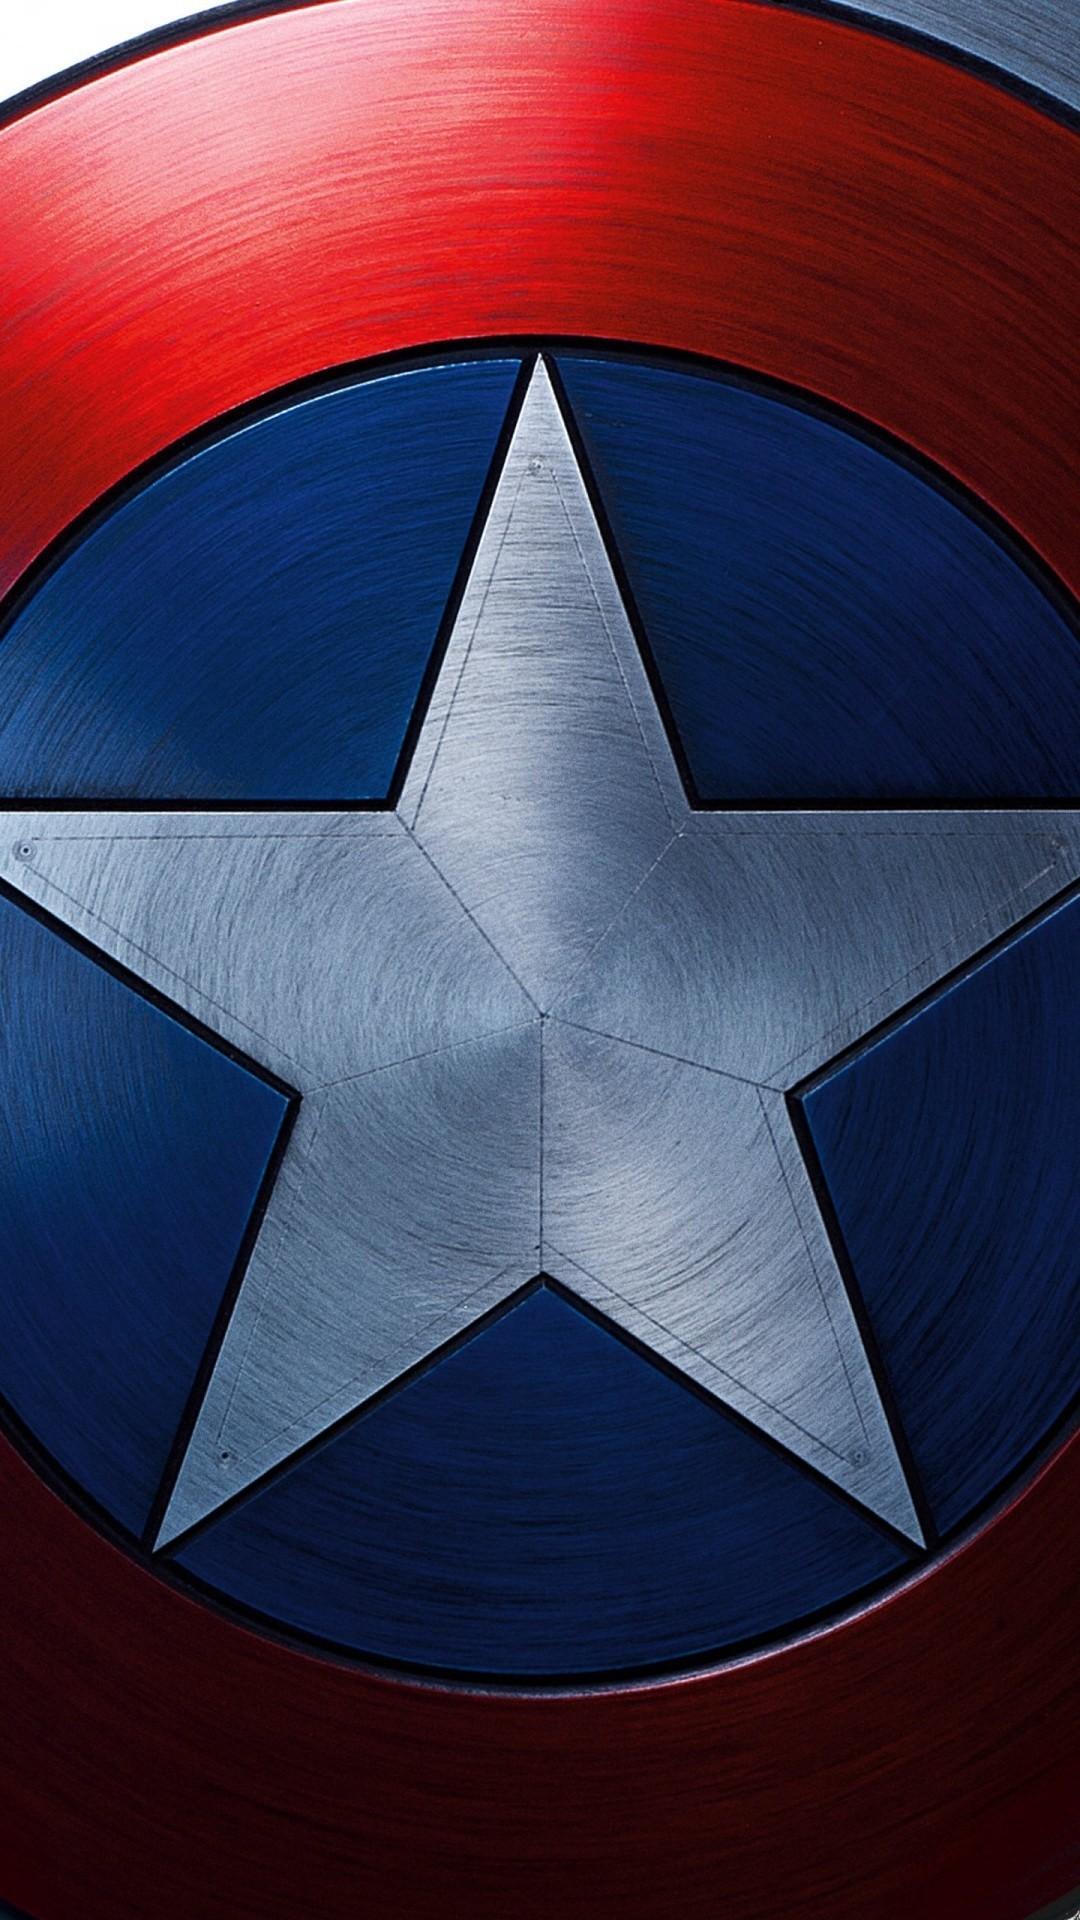 Captain America Civil War Hd Wallpapers For Iphone 7